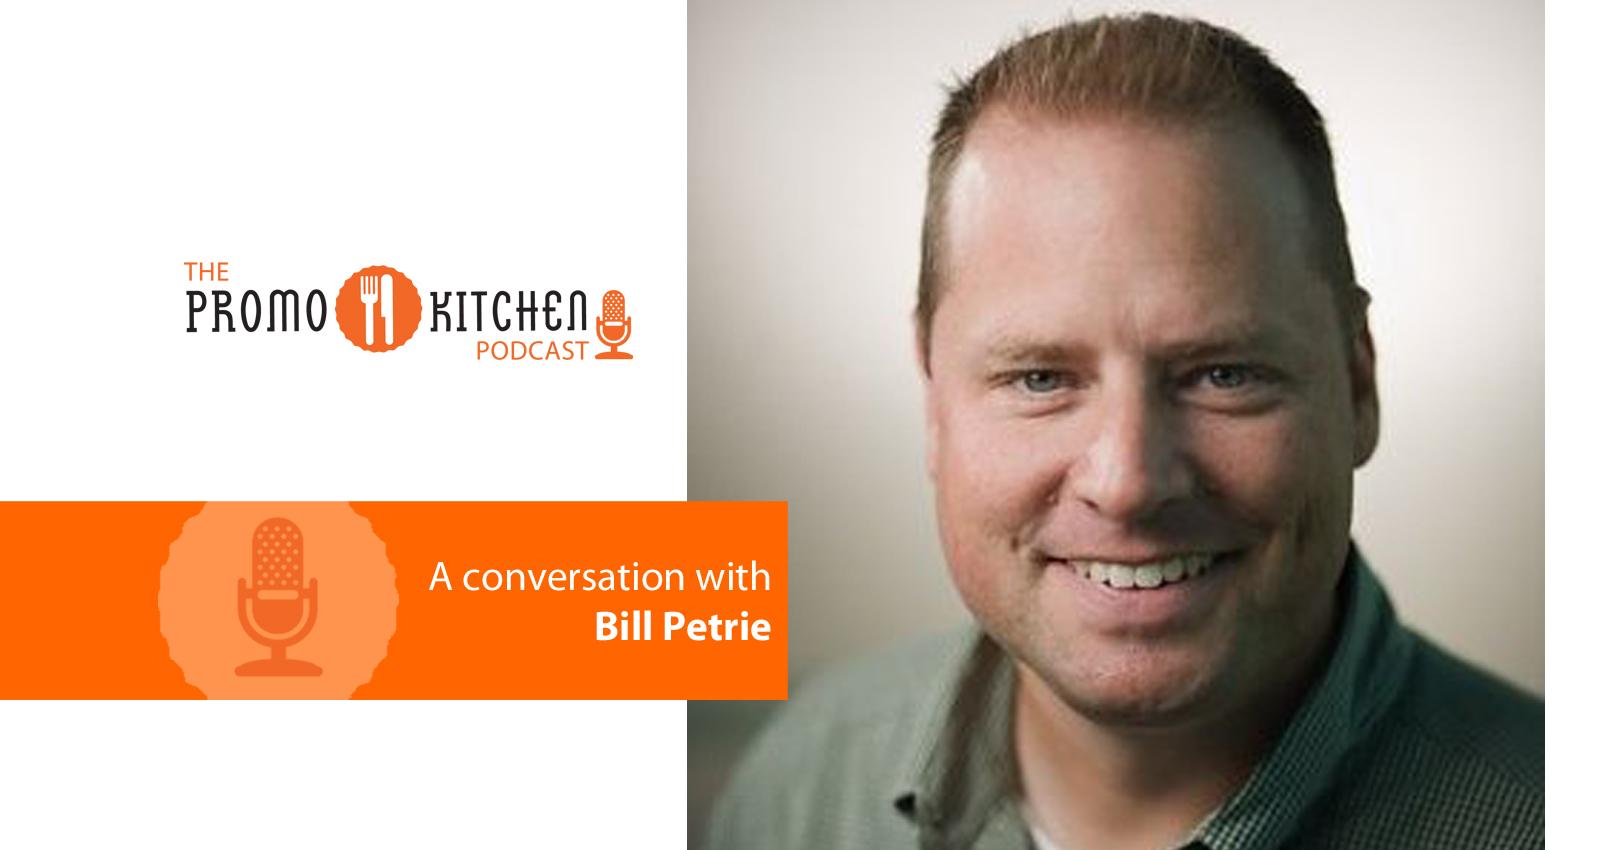 bill-petrie-podcast-graphic1.jpg